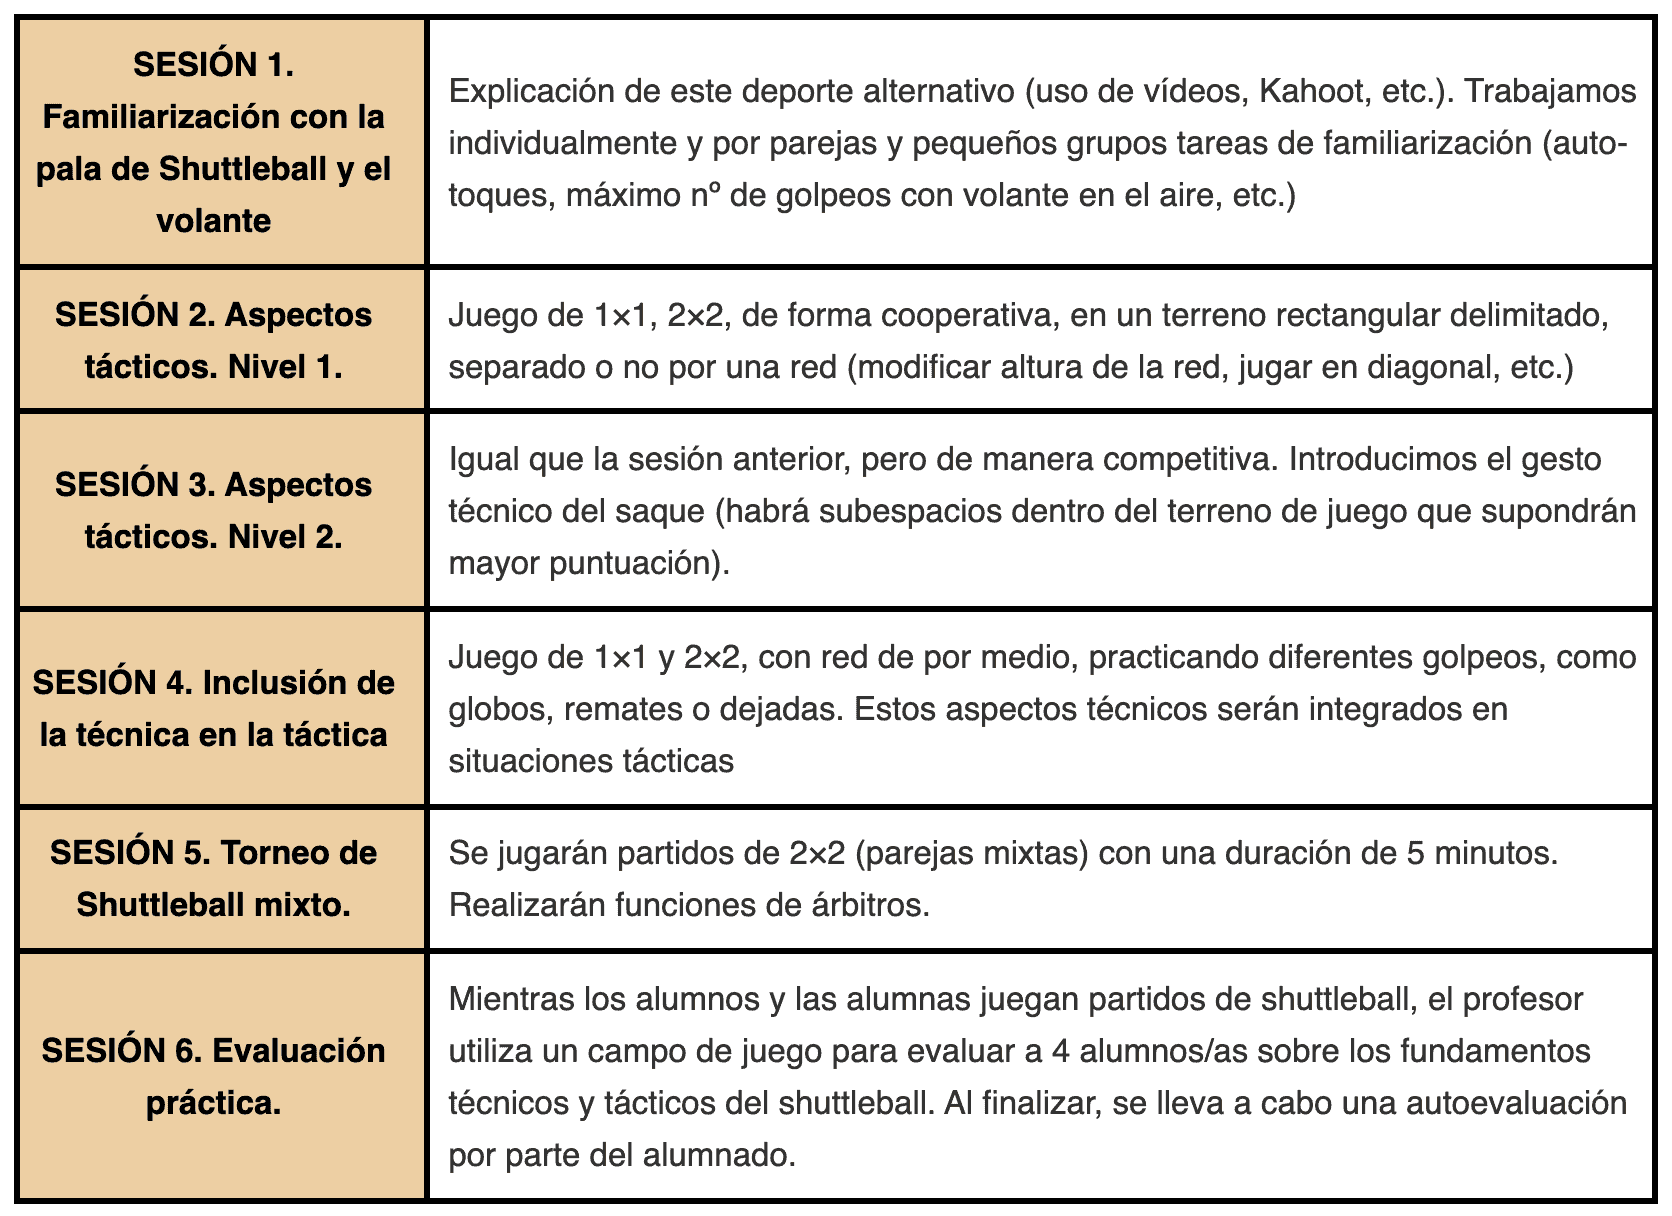 propuesta de ejercicios de shuttleball